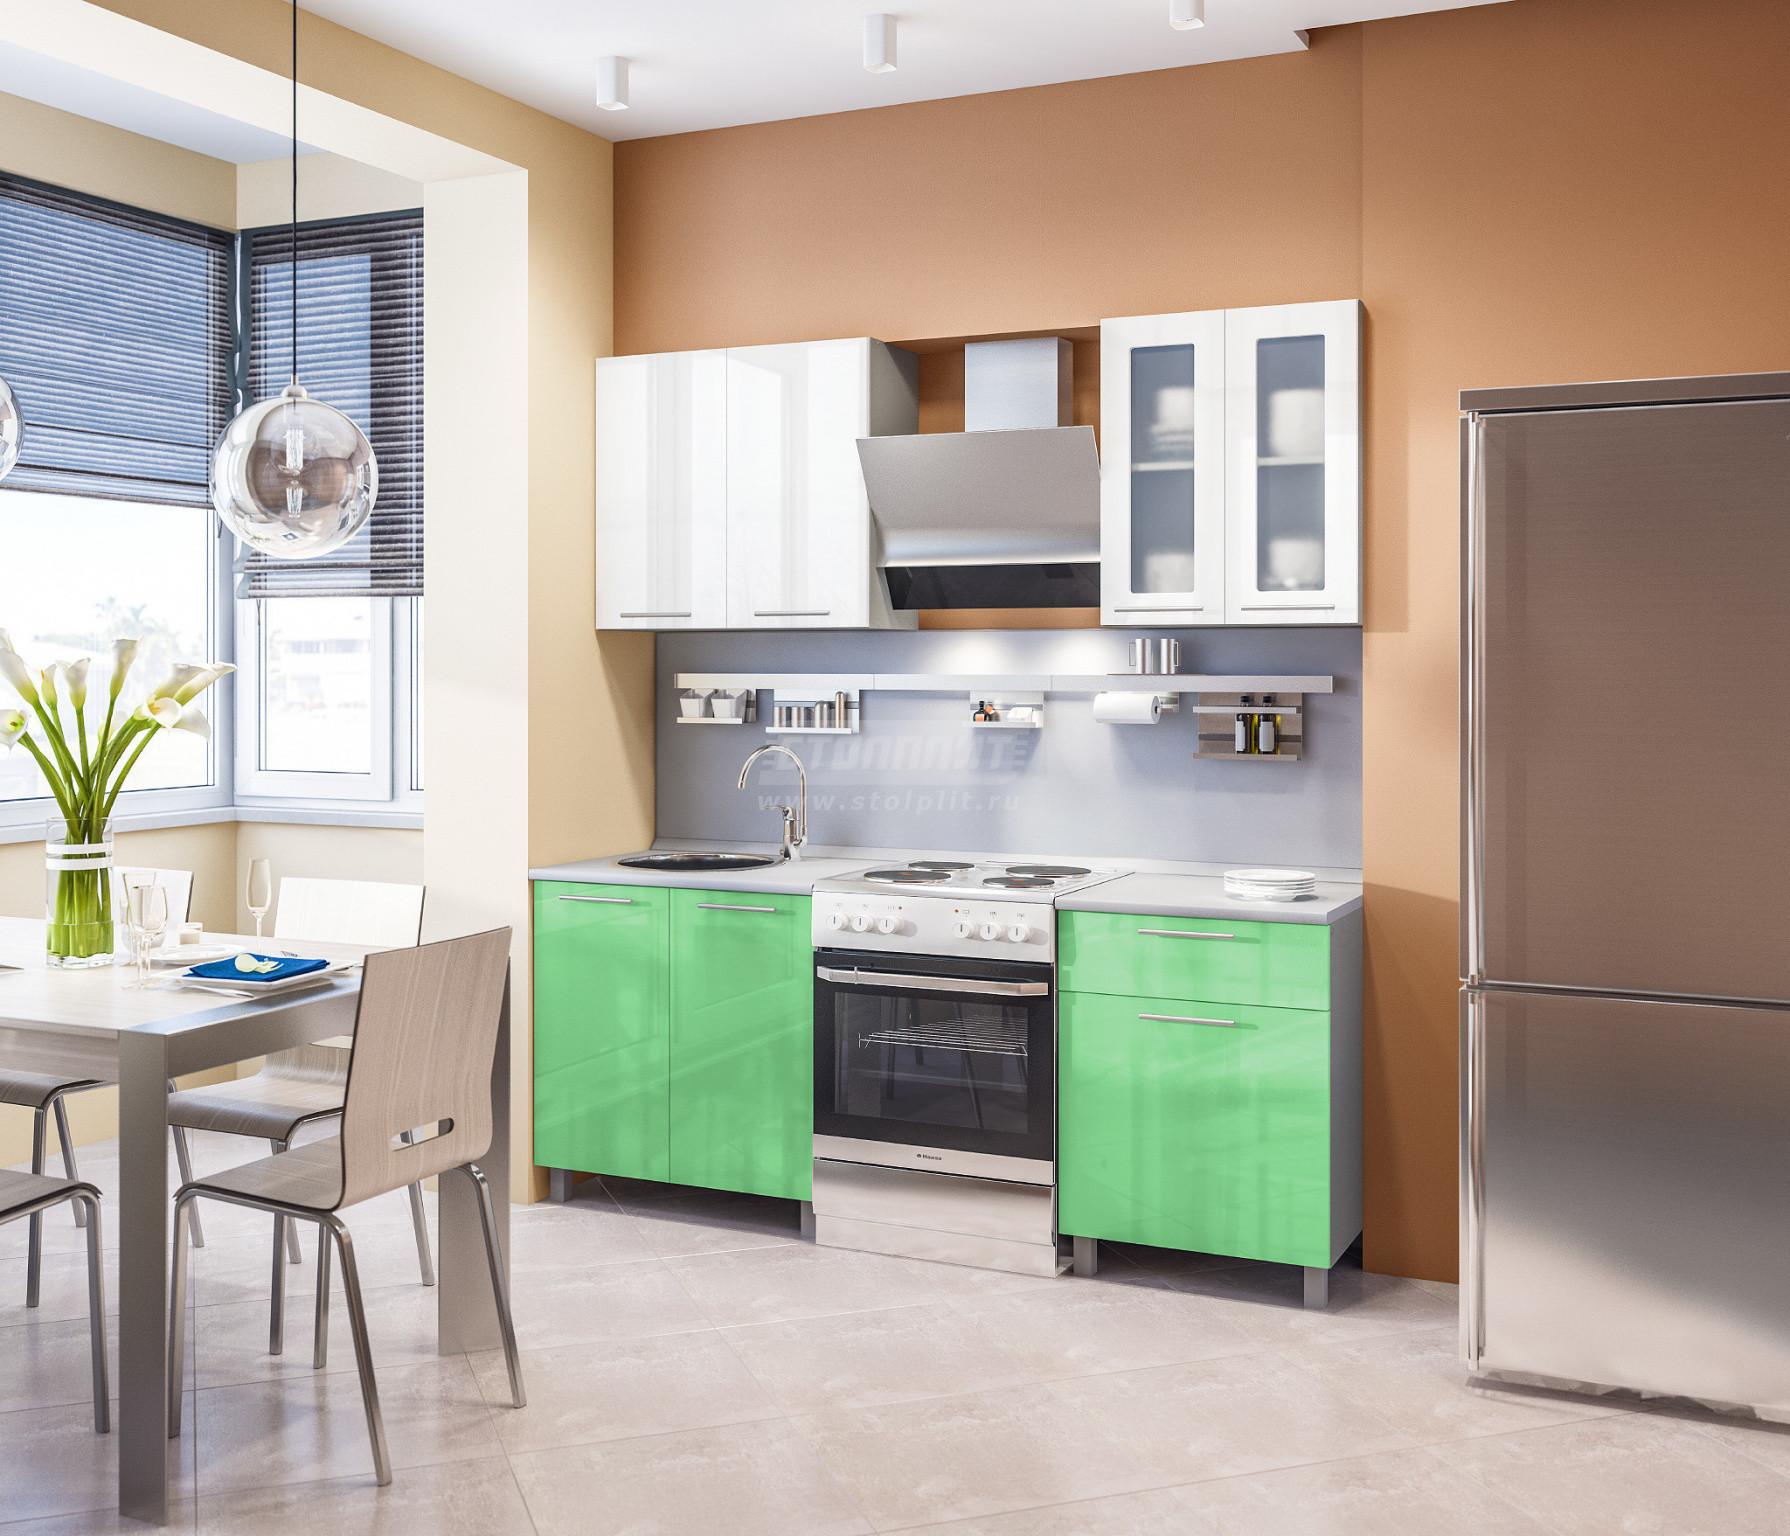 Кухня Столплит Анна L-2000 алюминий/белый глянец/эвкалипт глянец 140x214x60 см